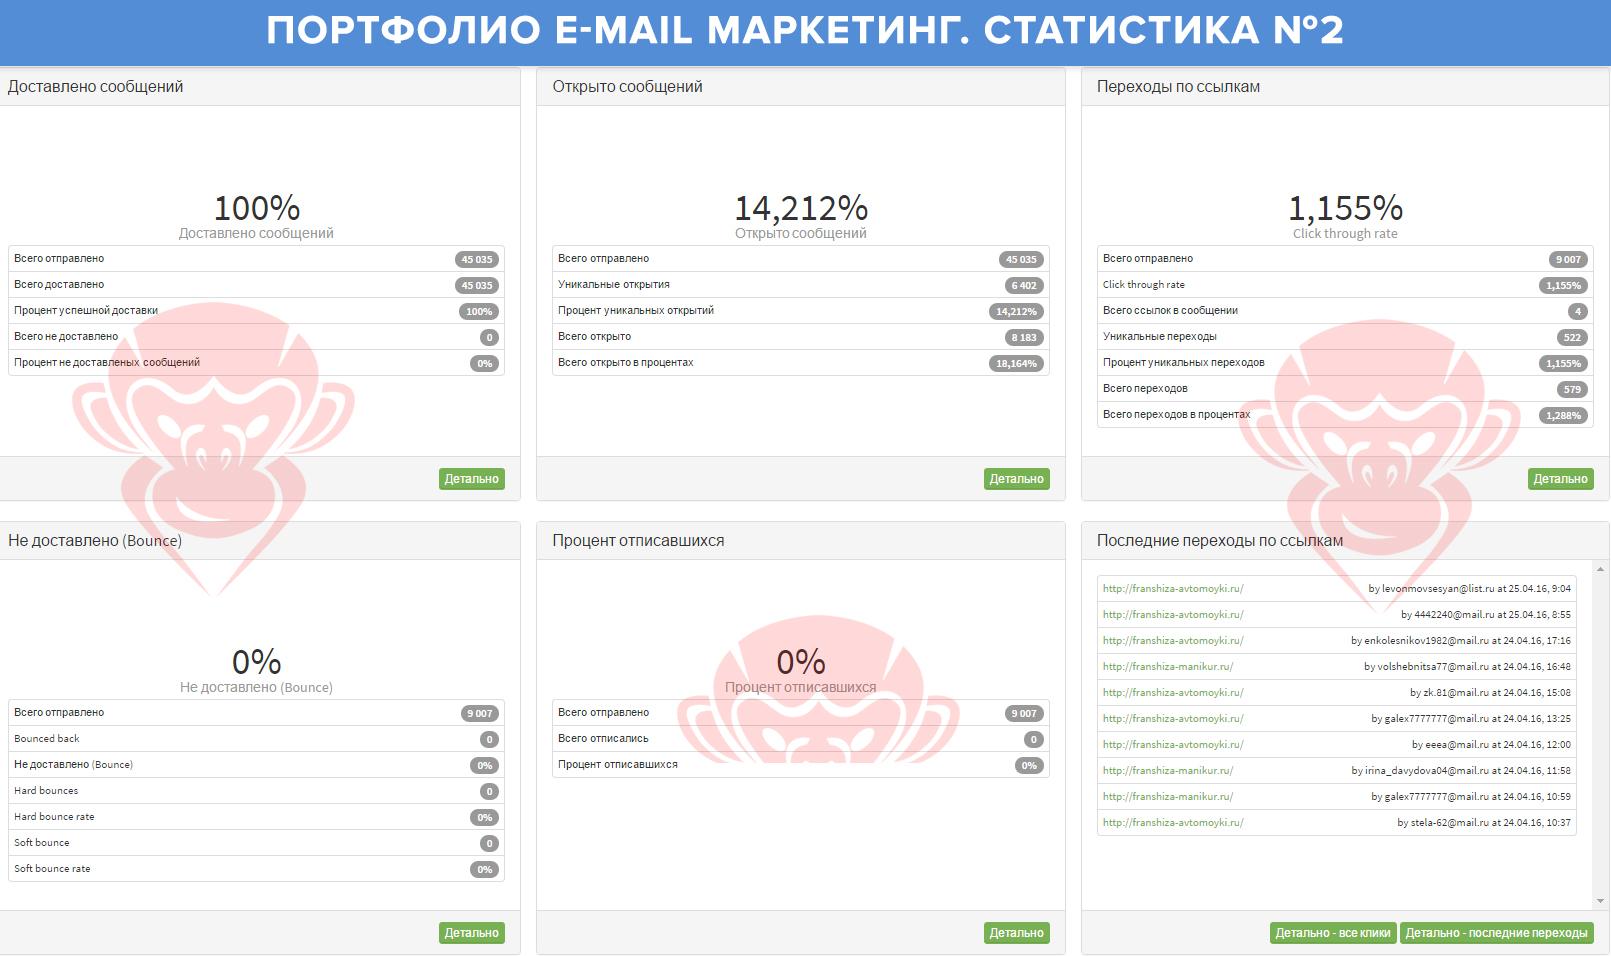 Портфолио E-mail маркетинг 2